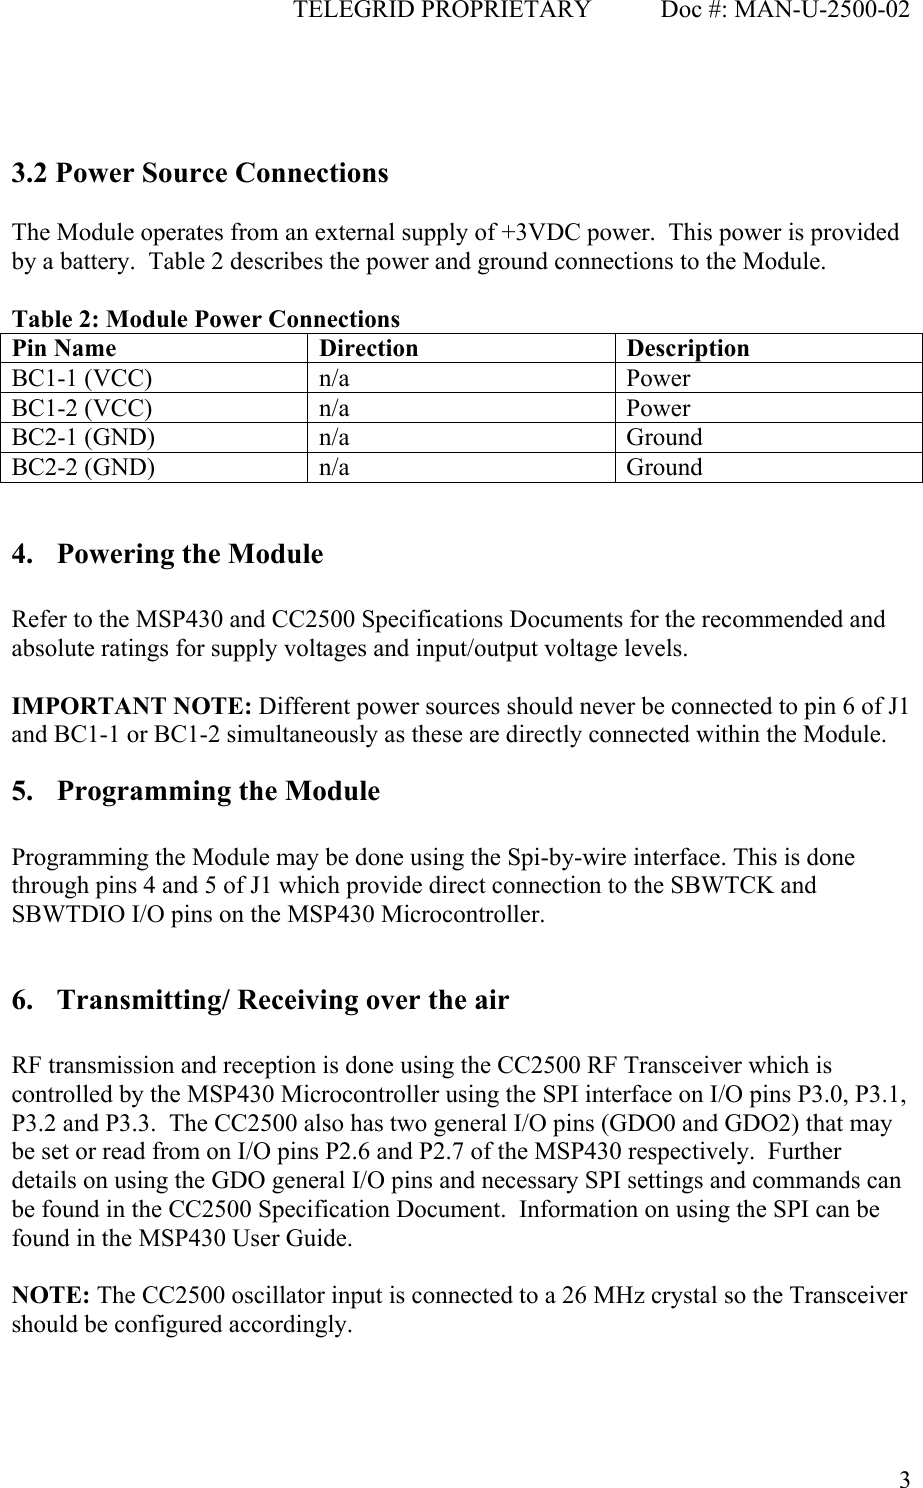 TELEGRID Technologies W2500 RF Module CCA-SA-W2500-02 User Manual